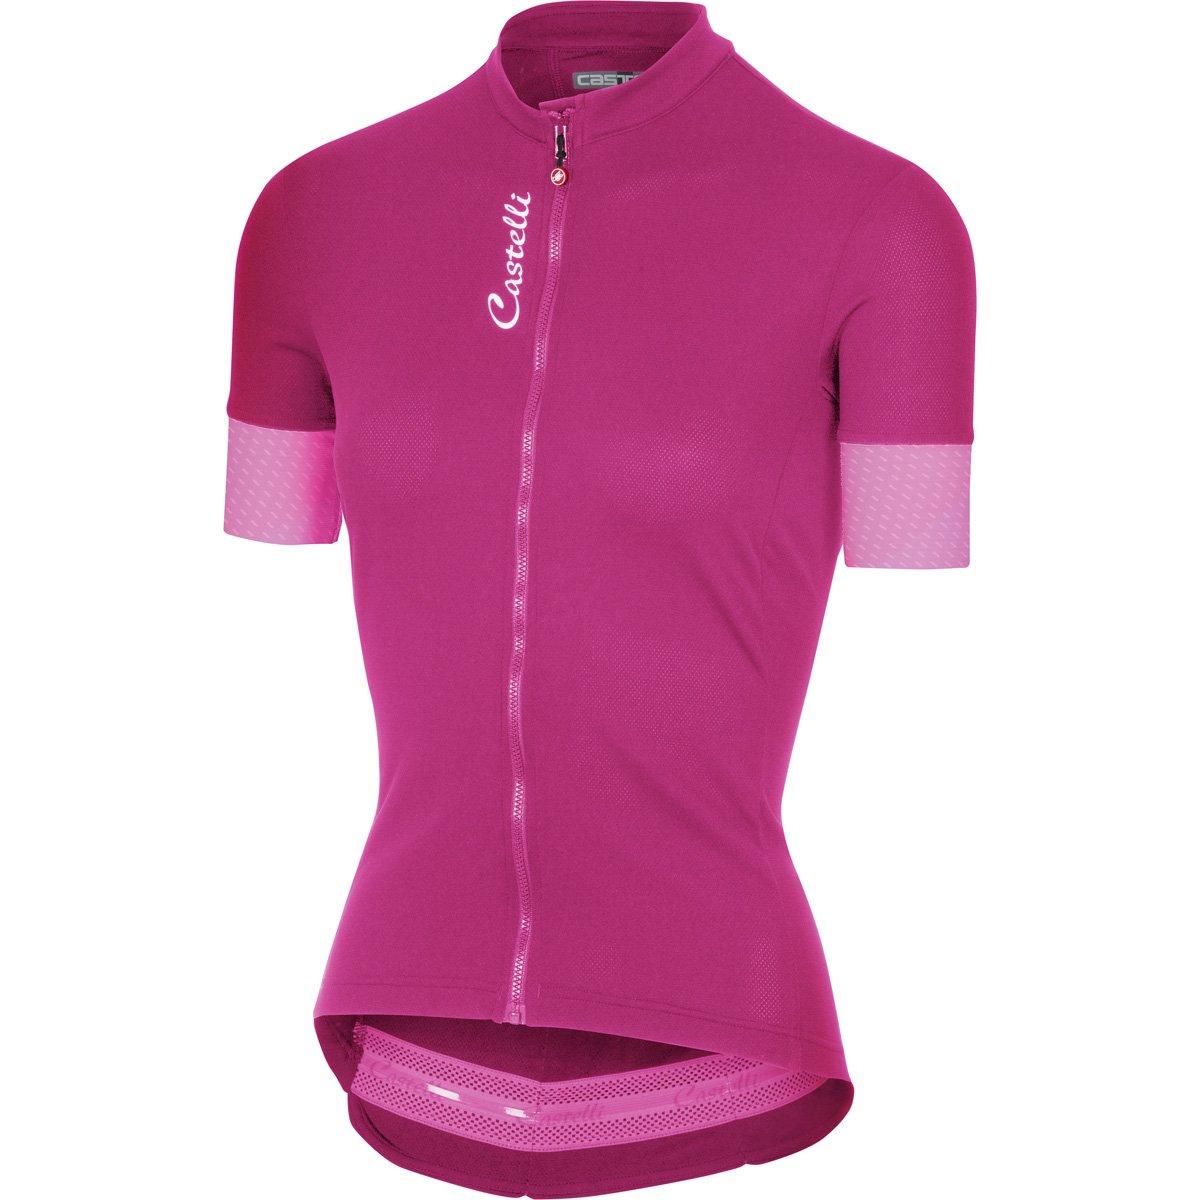 Castelli Anima 2 Jersey FZ B07955WQ8X  alba pink X-Large